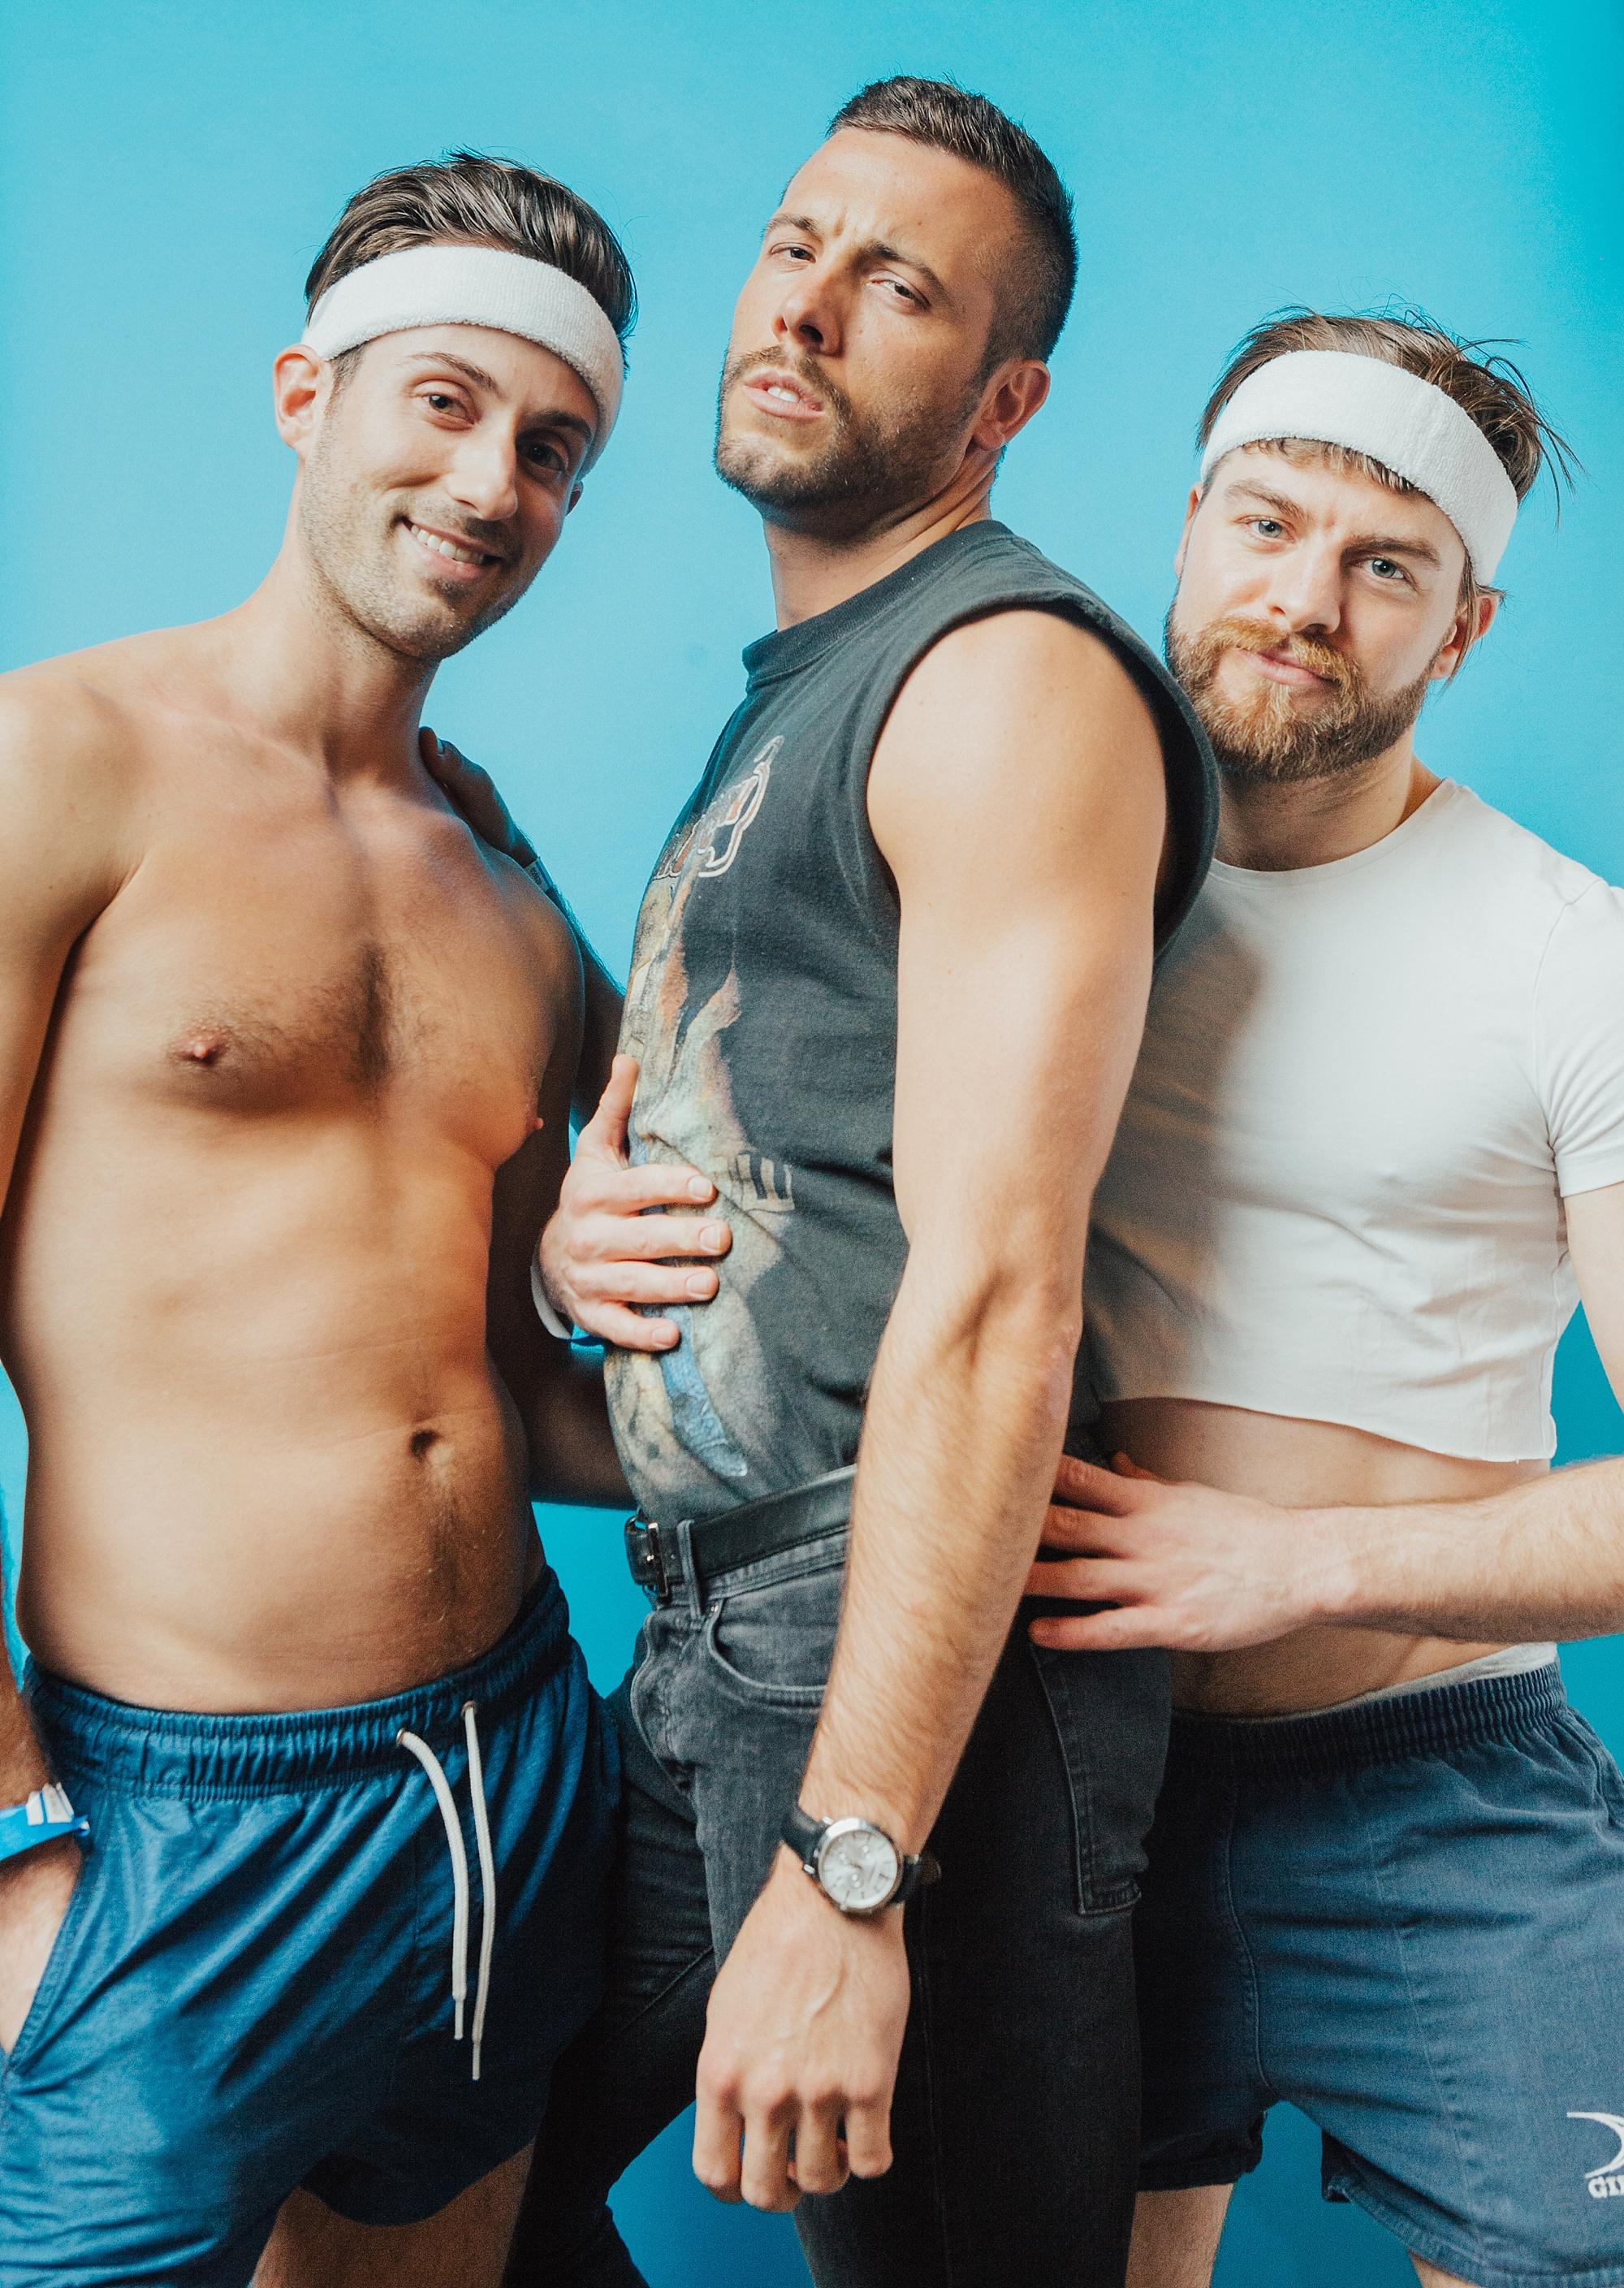 Joe_Mac_Creative_LGBT_Photographer_Philadelphia_Gay_Business__0020.jpg